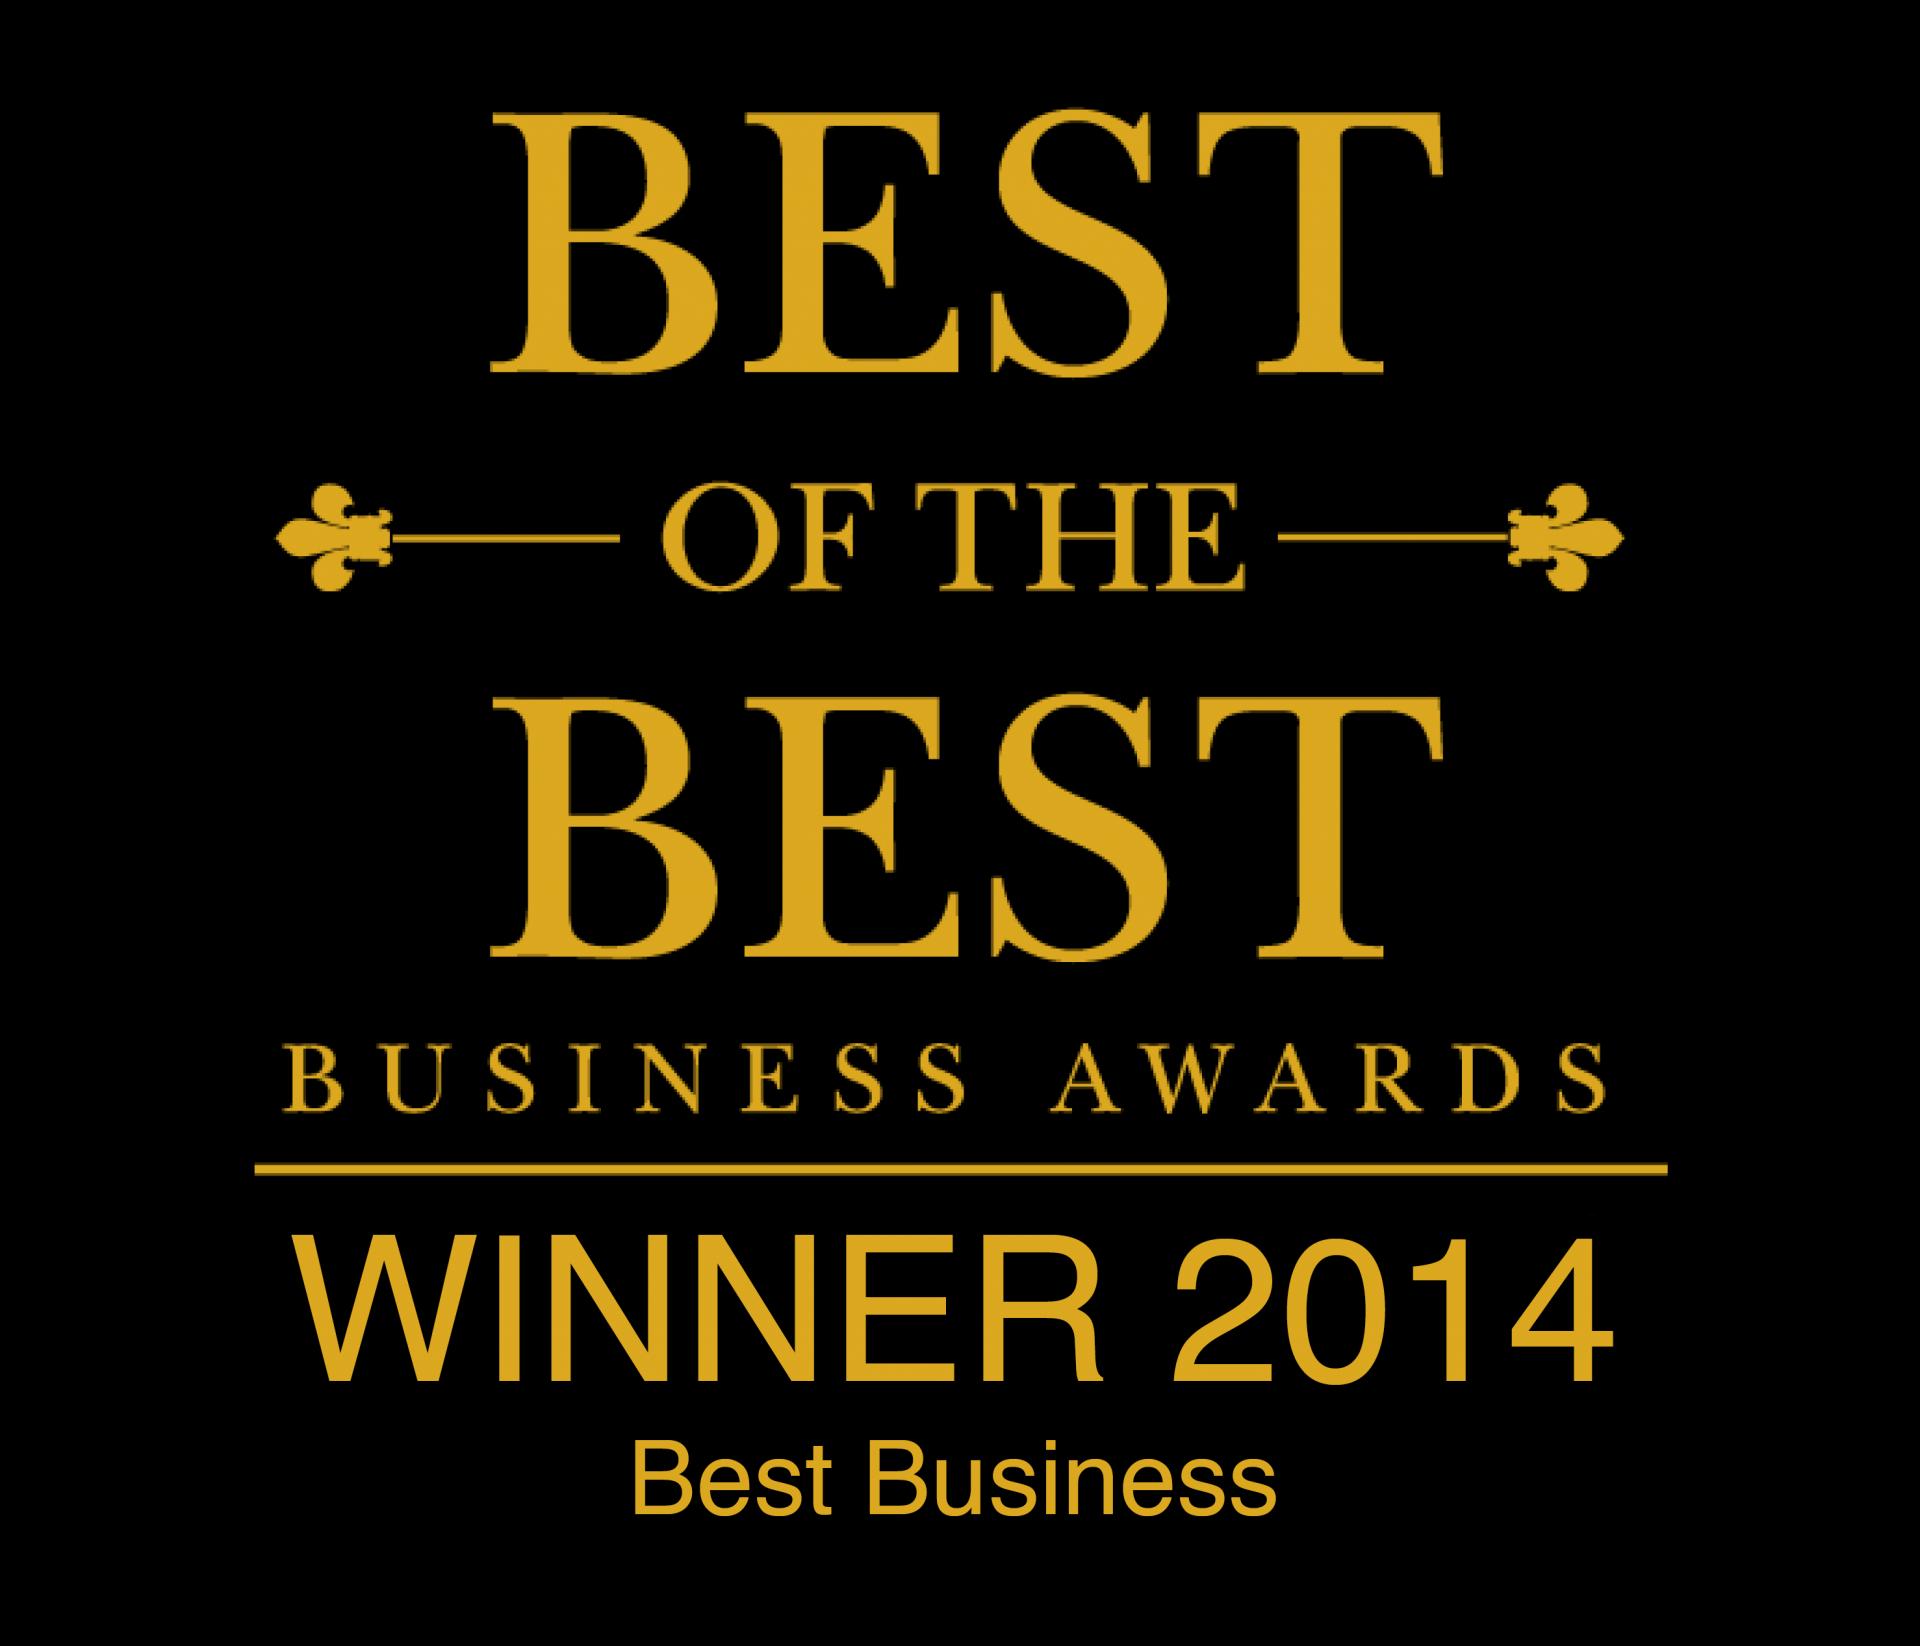 Best of the Best Business Awards Winner 2014